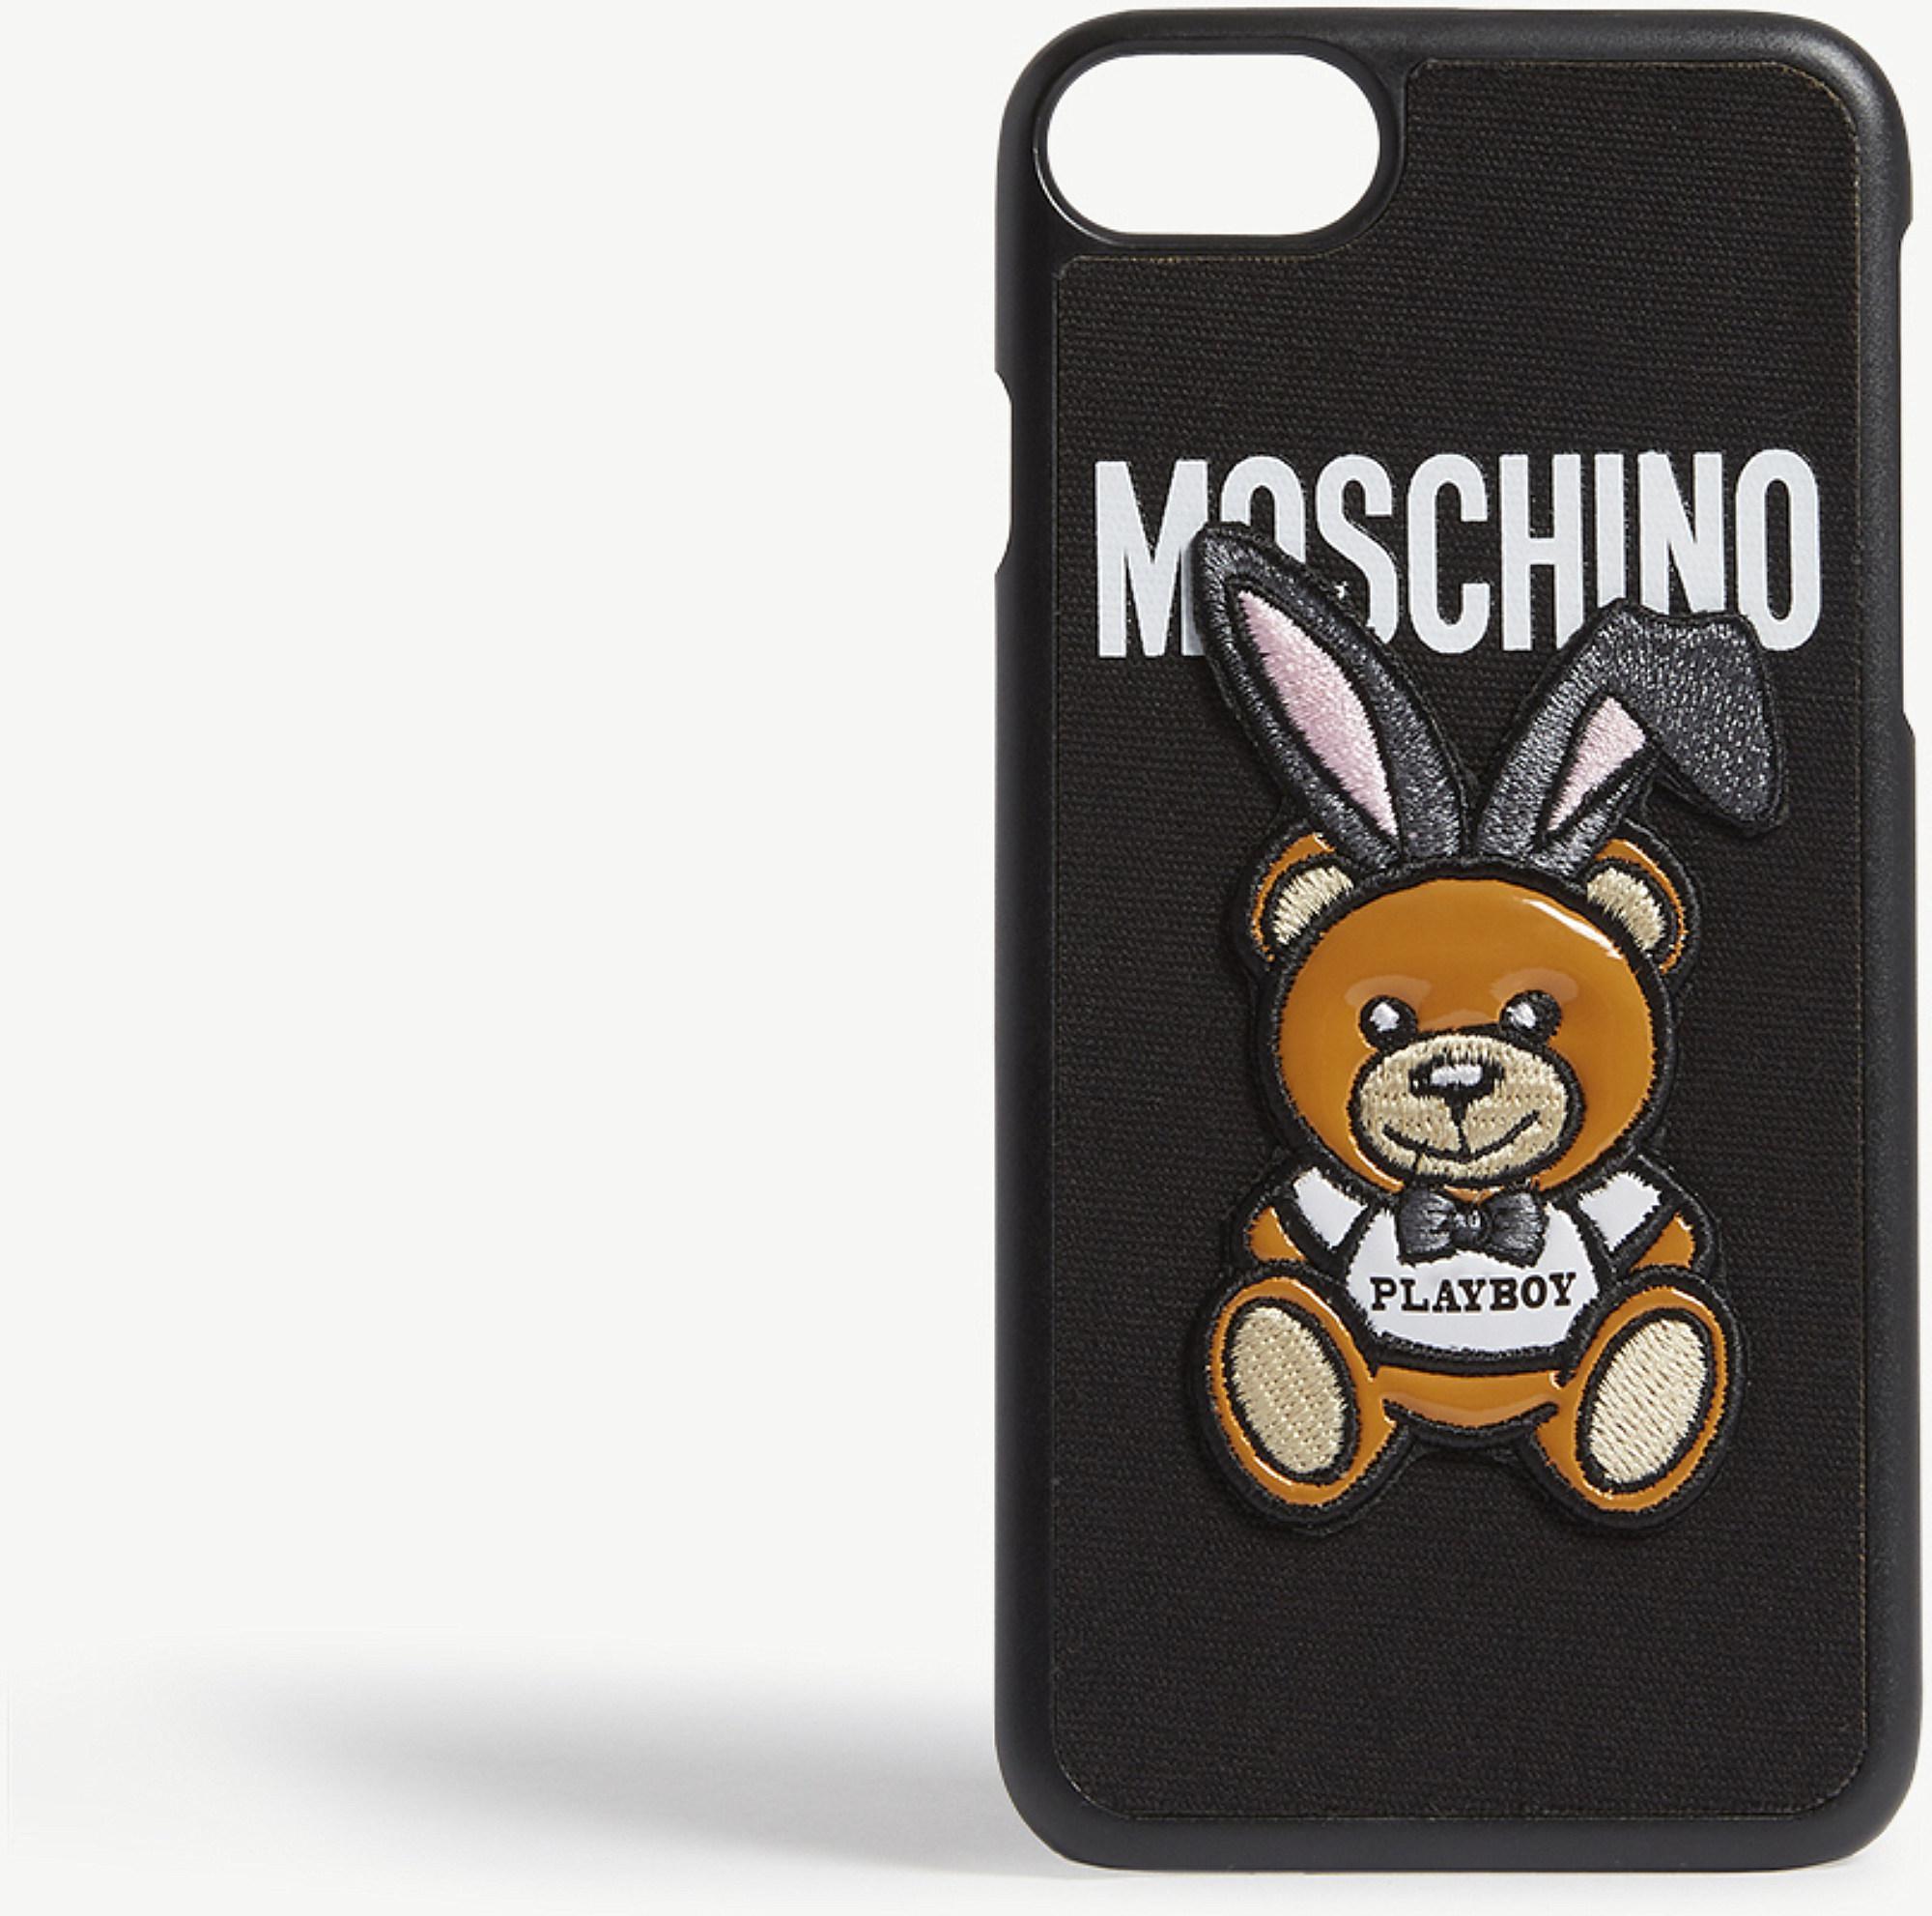 online store 5307b ab0f2 Moschino Black Playboy Teddy Iphone 7 Case